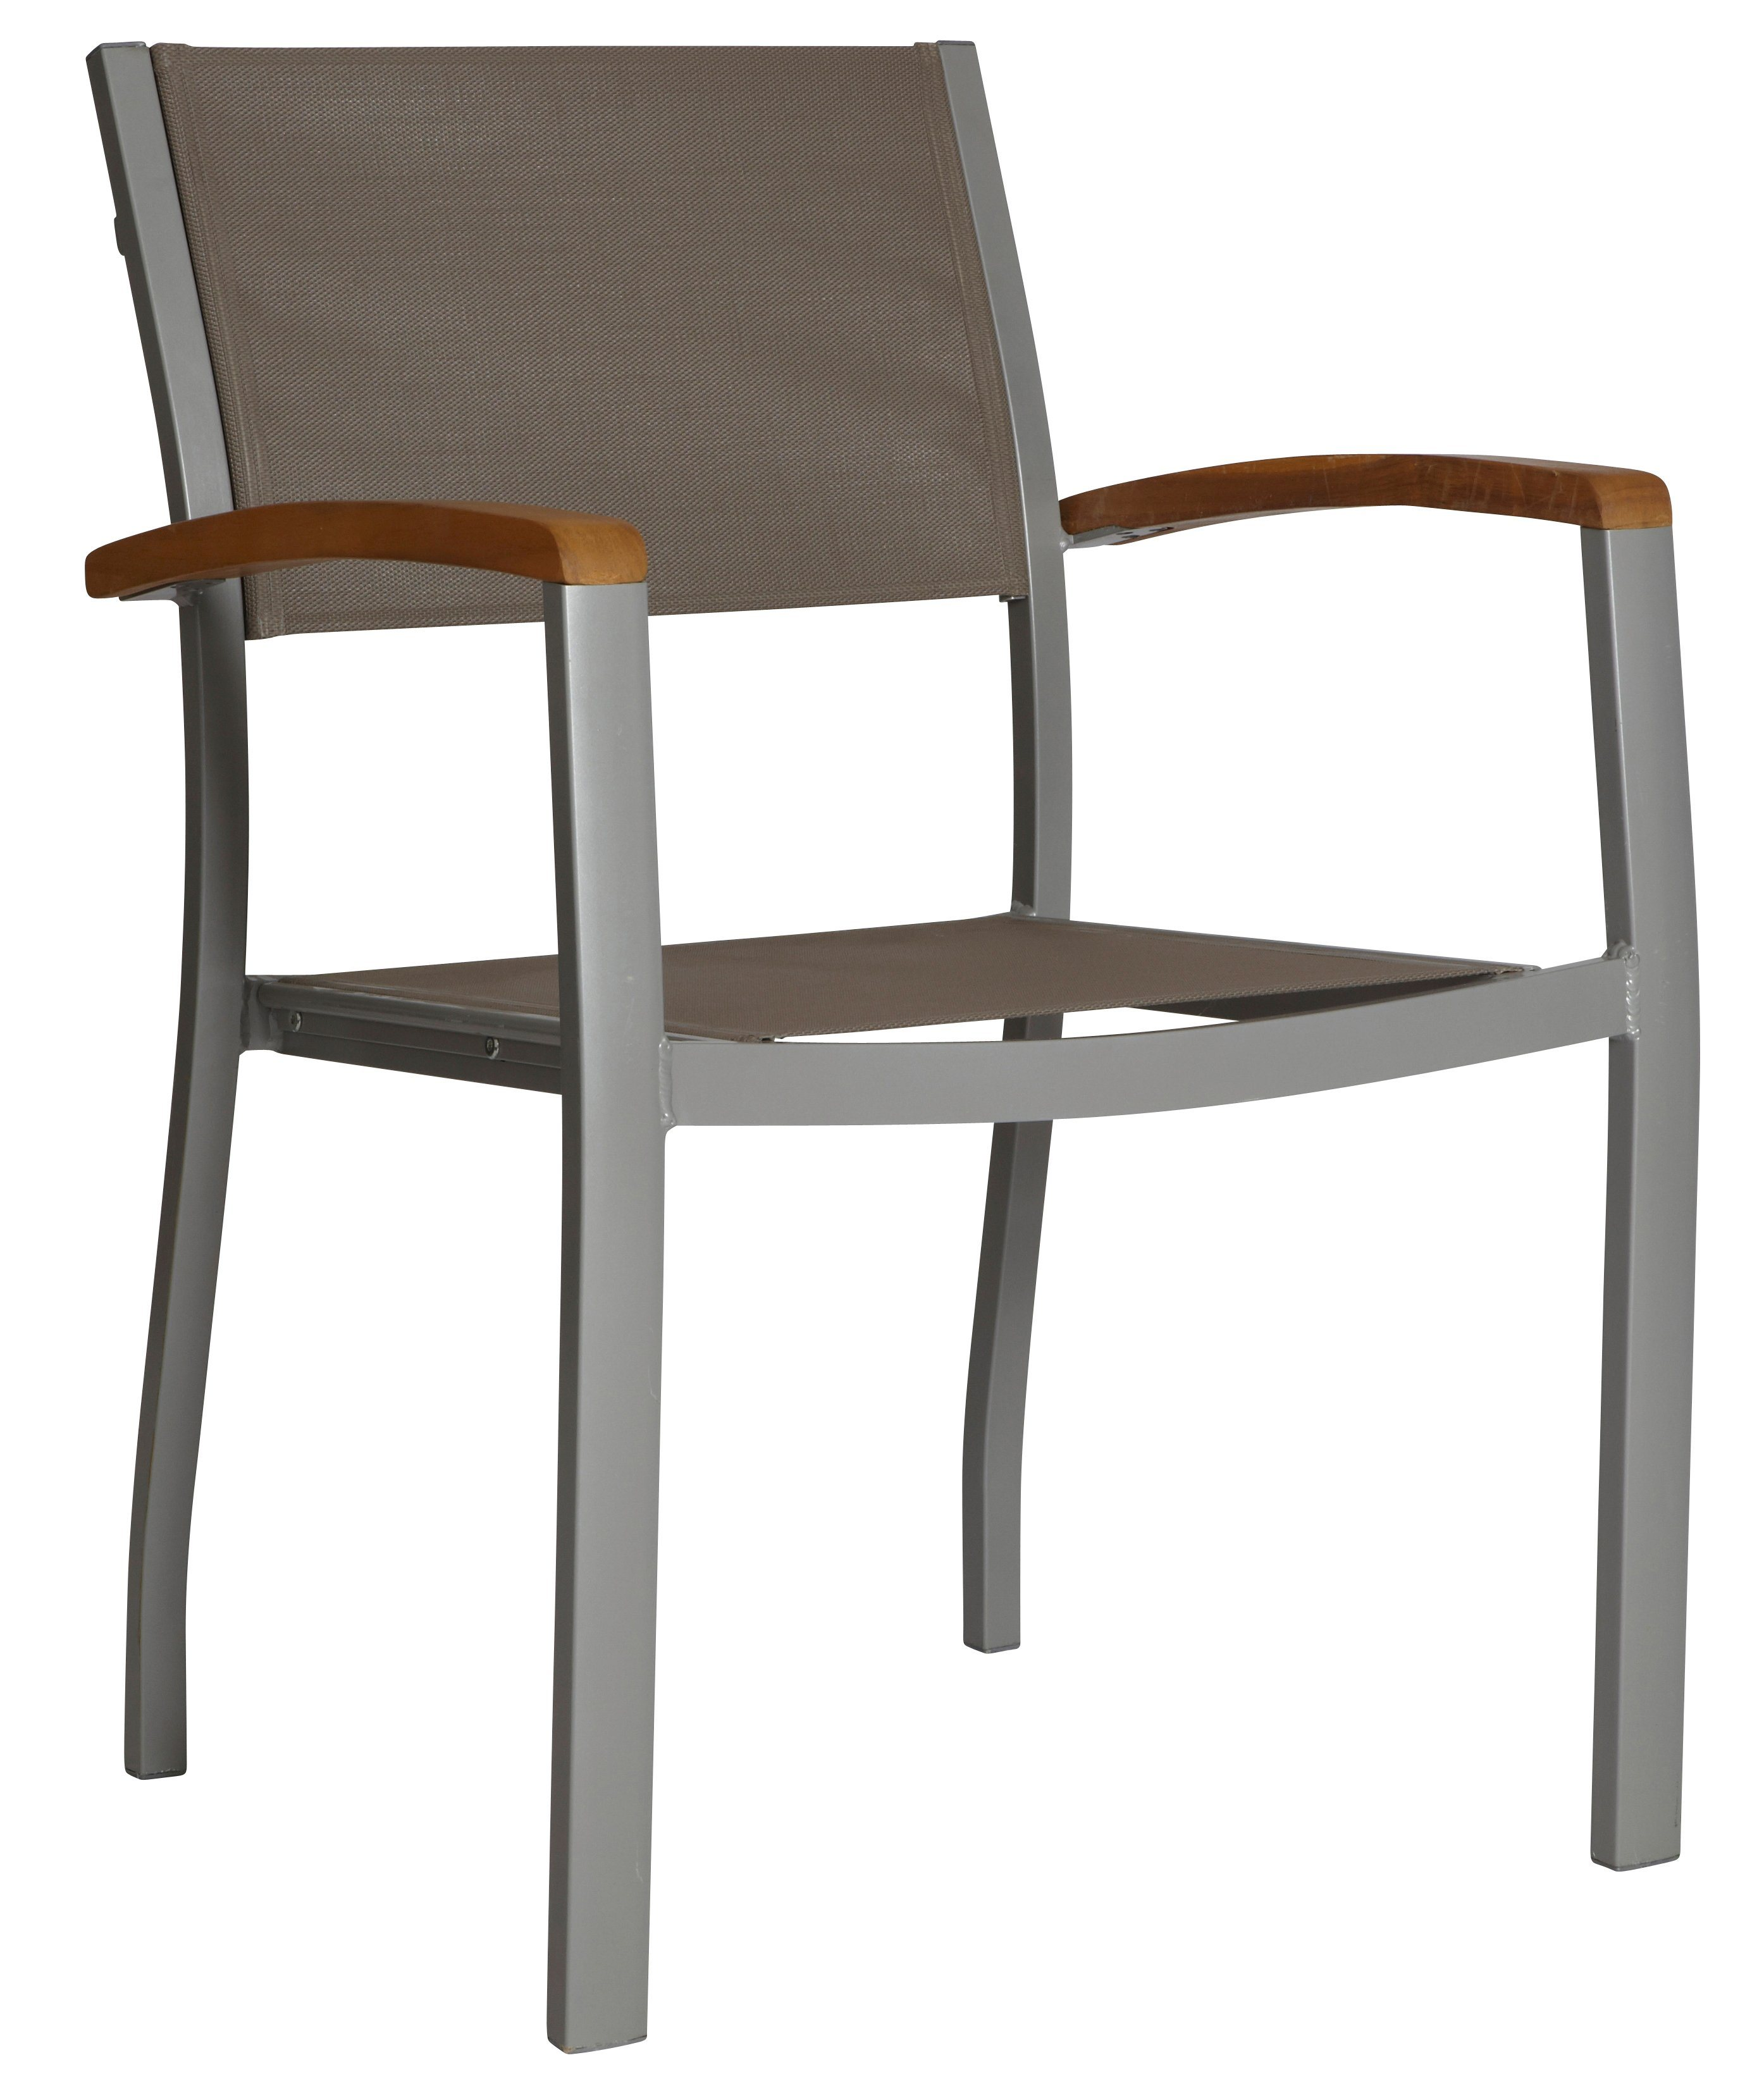 Perfekt Gartenstuhl »Monaco«, Aluminium/Textil/Akazie, Stapelbar, Grau